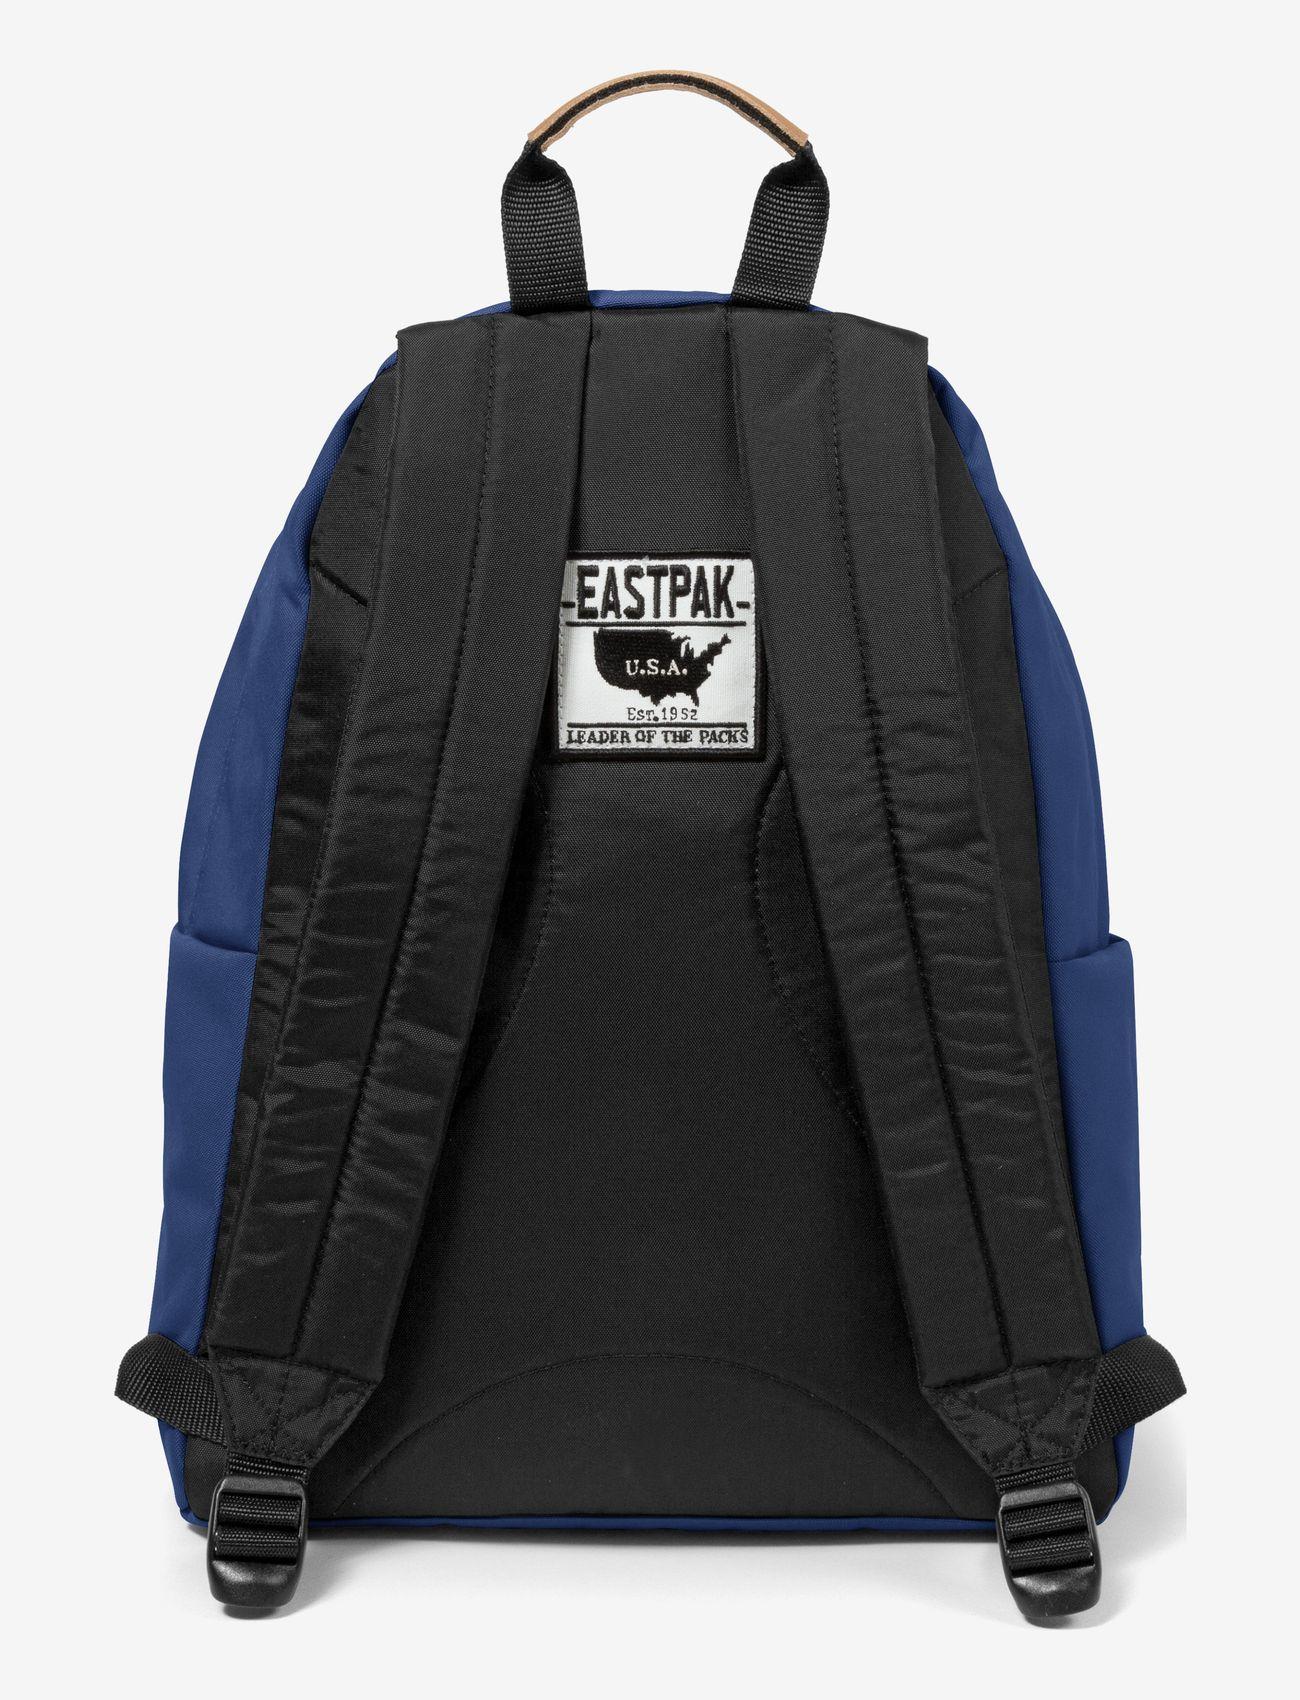 Eastpak - PADDED PAK'R - backpacks - into tan navy